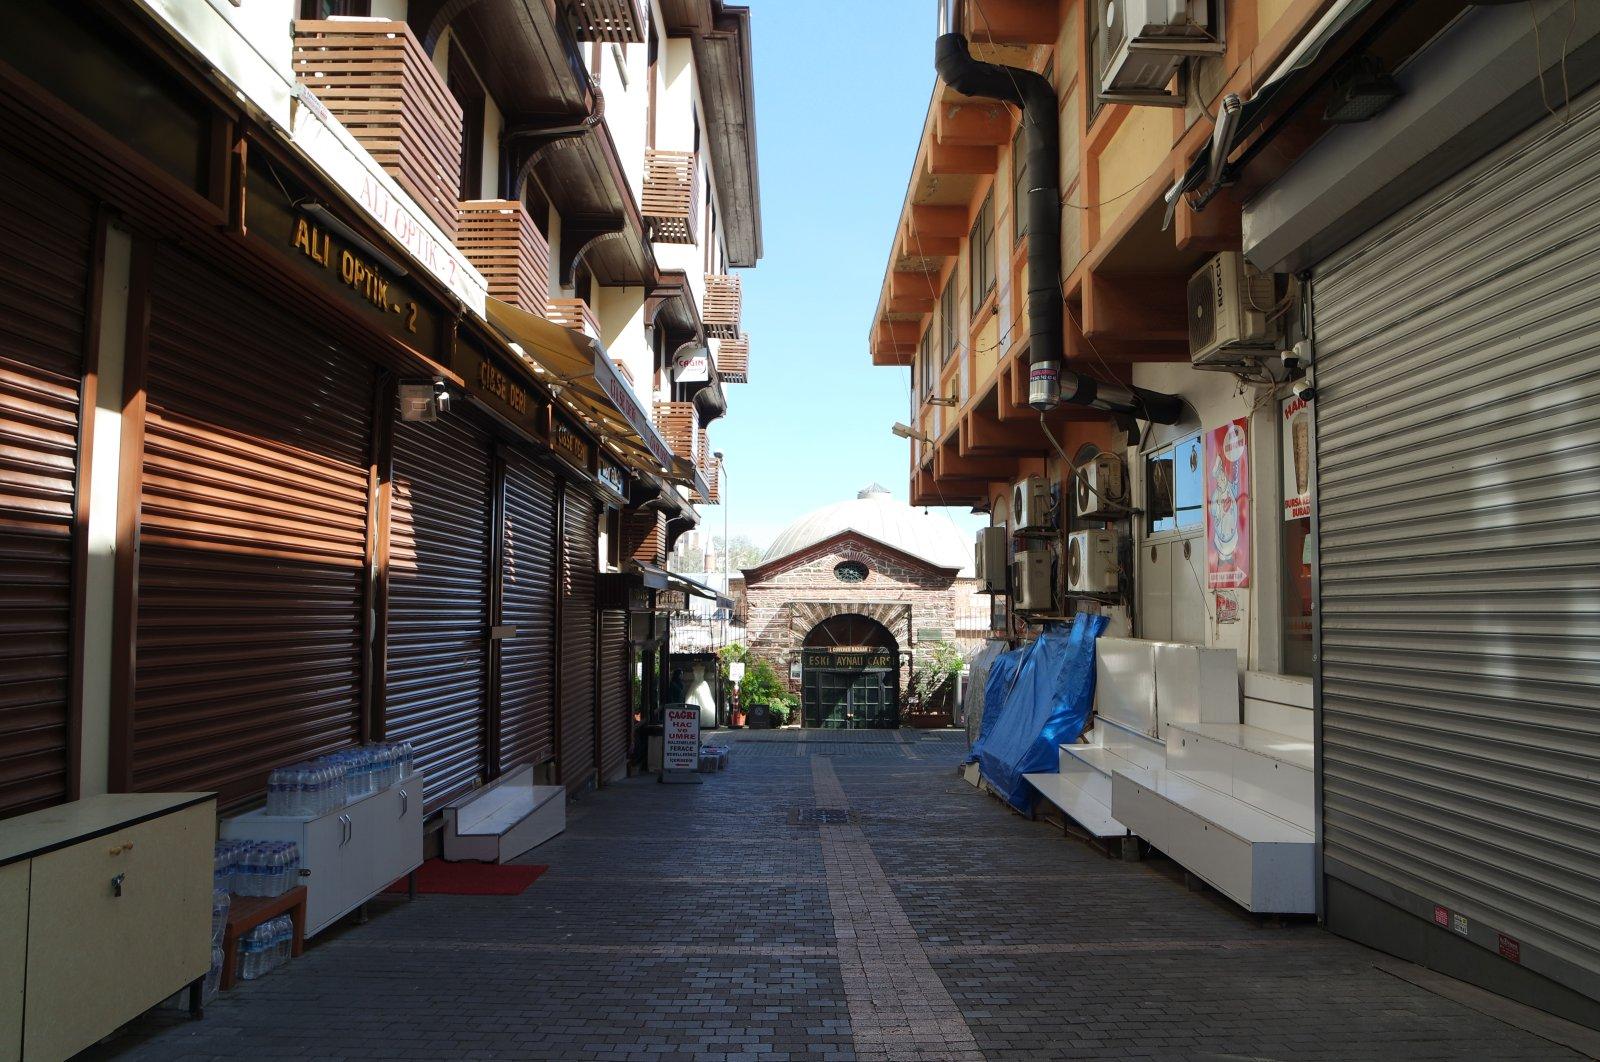 Temporarily closed stores due to coronavirus pandemic seen in northwestern Bursa province, Turkey, April 17, 2020. (AA Photo)